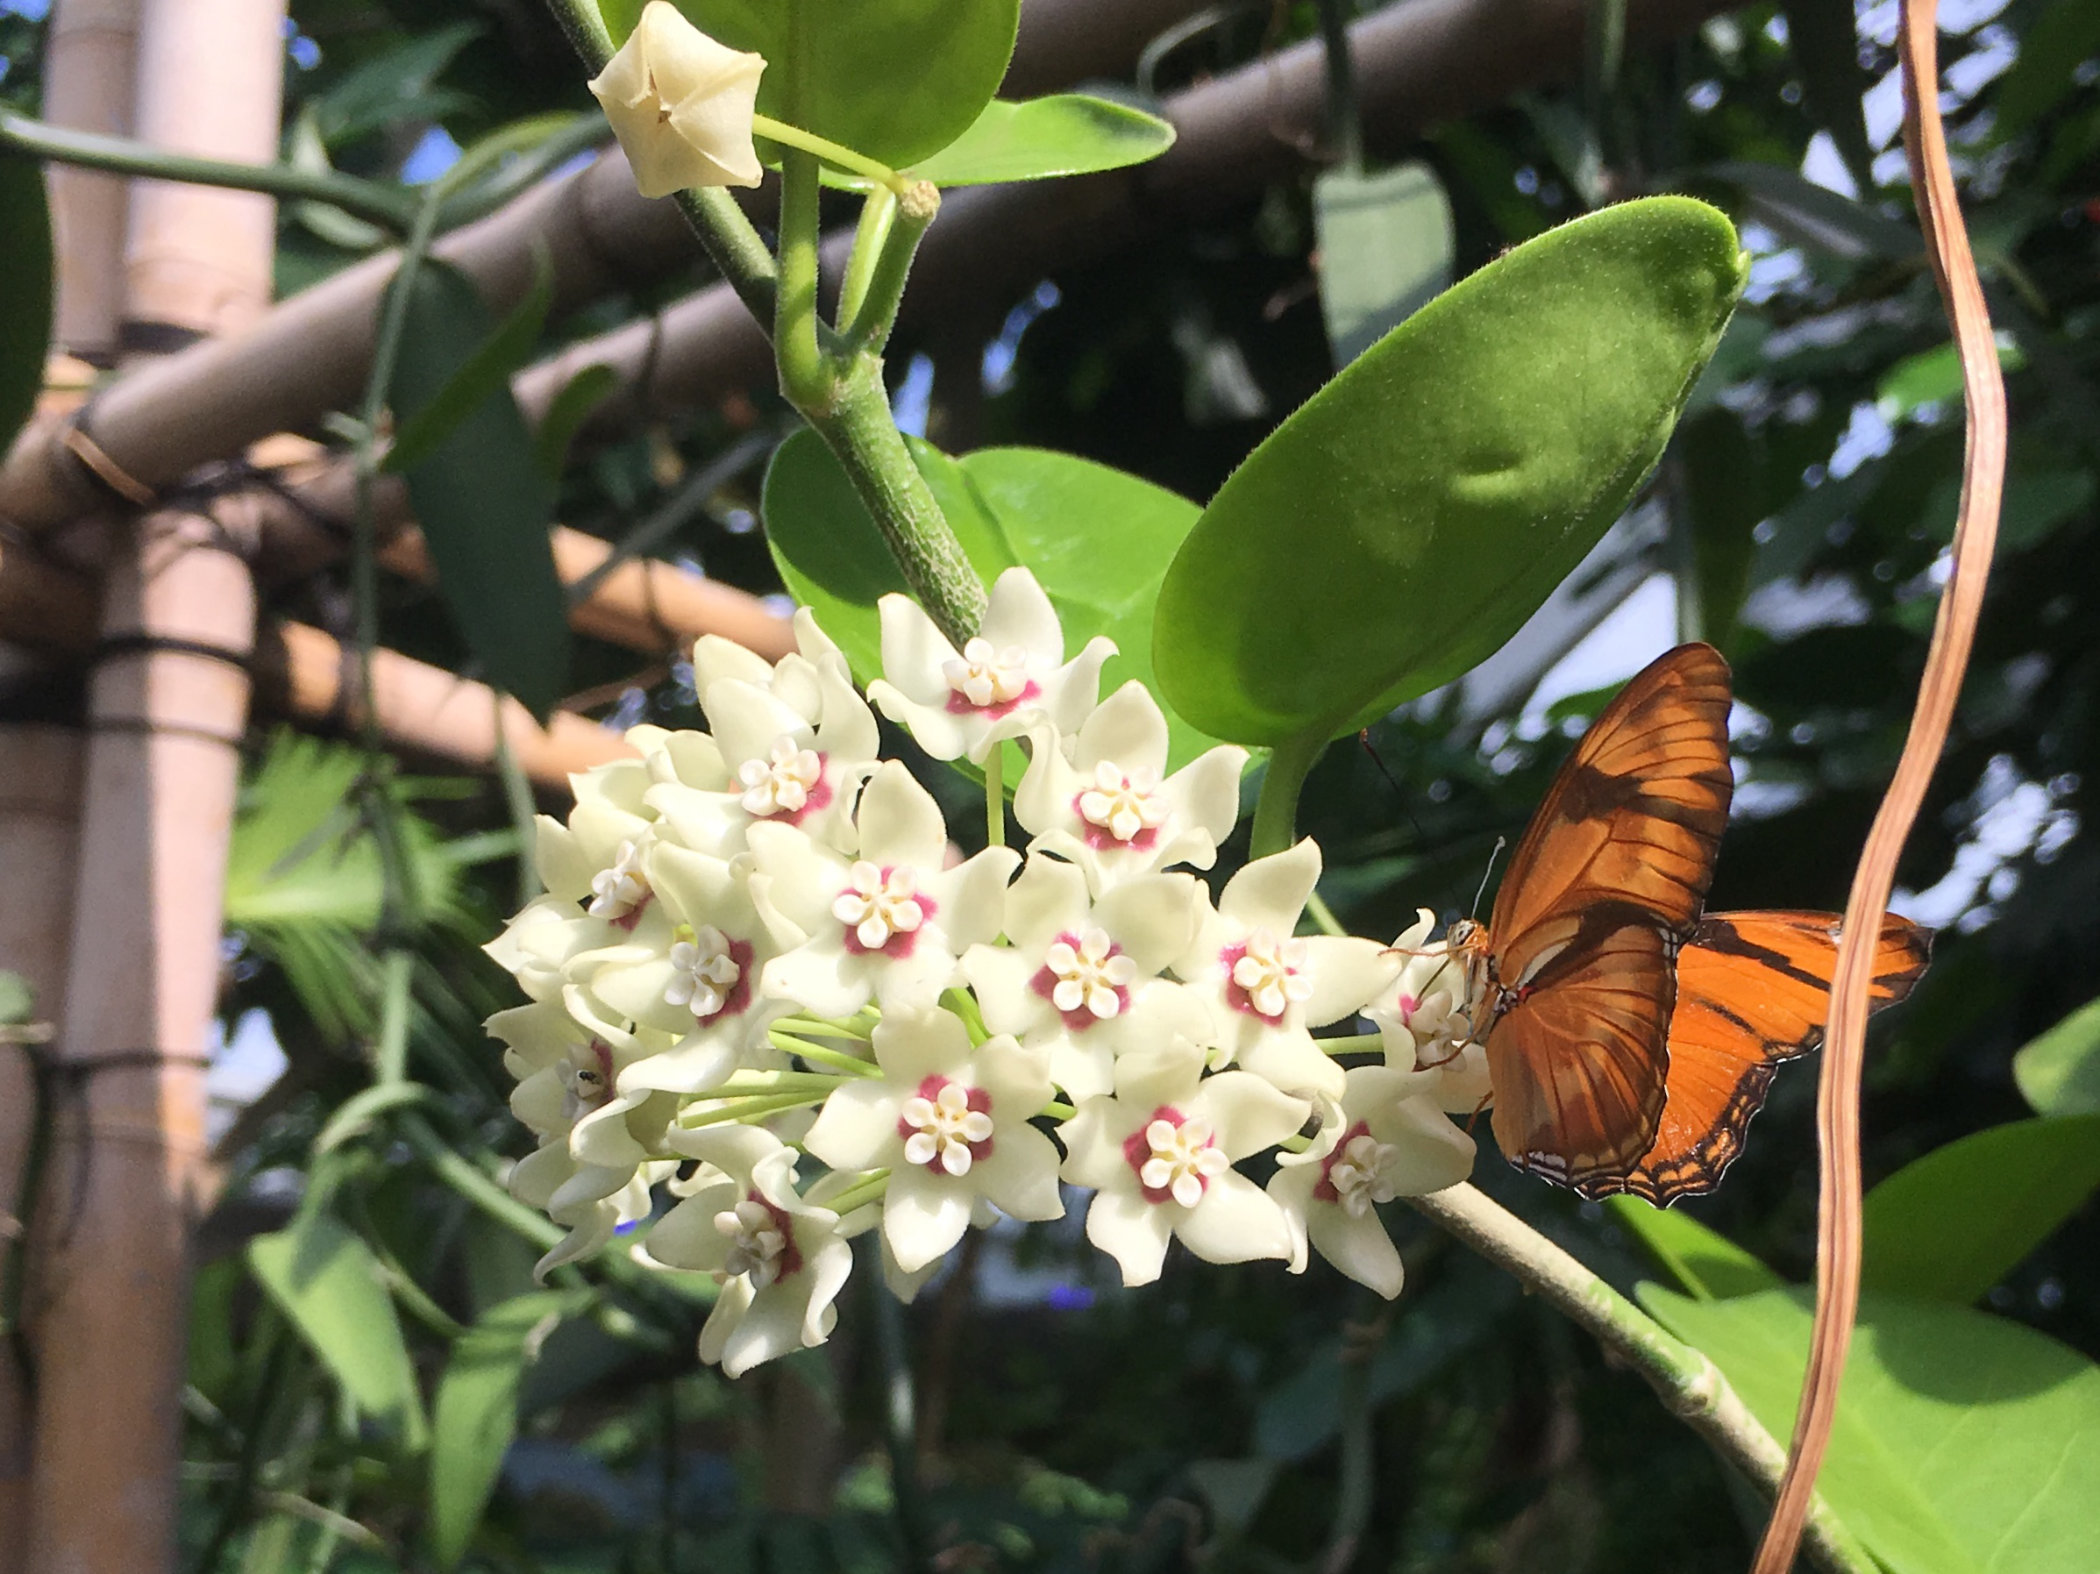 butterfly on white flowers.jpg